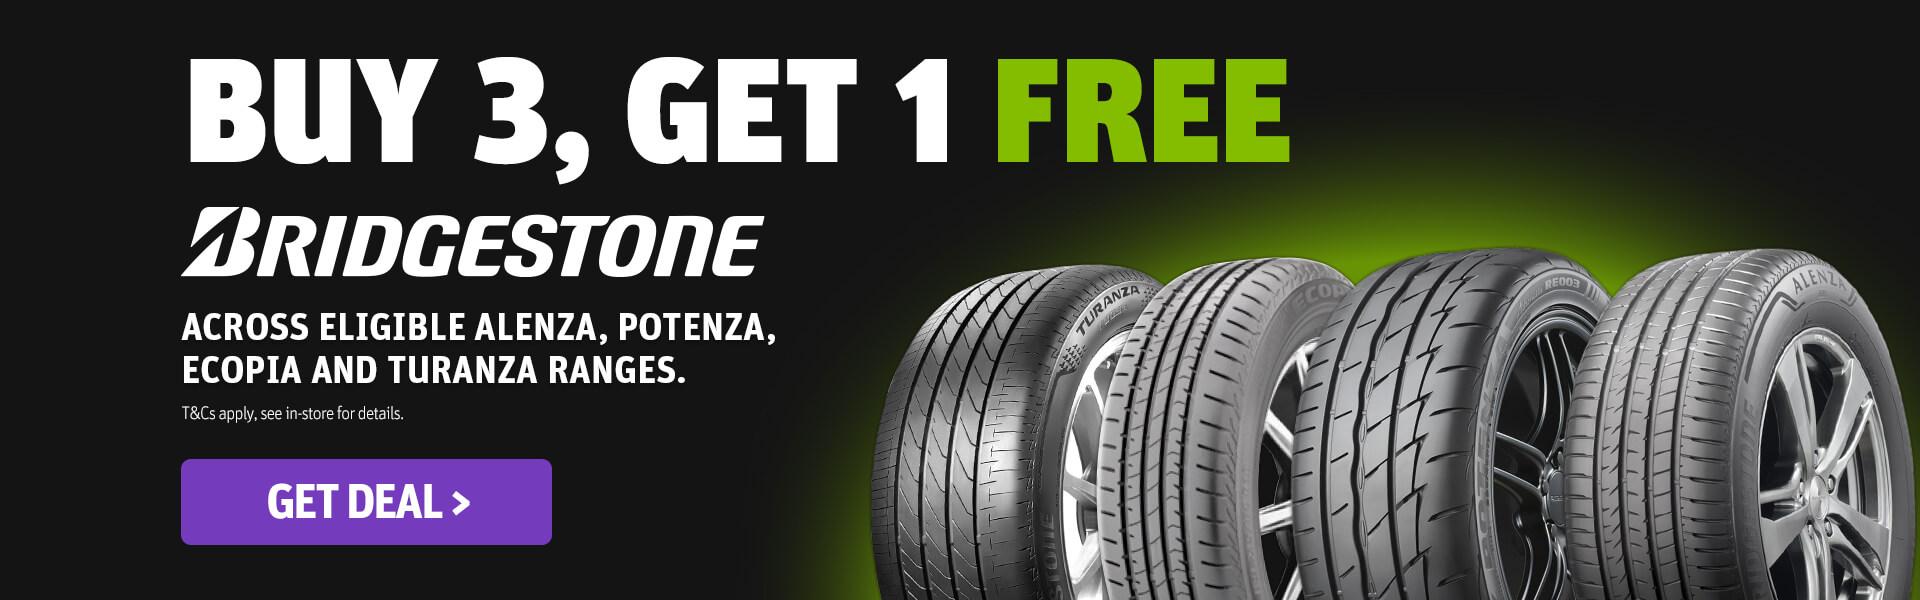 CDT - Bridgestone Buy 3, Get 1 FREE